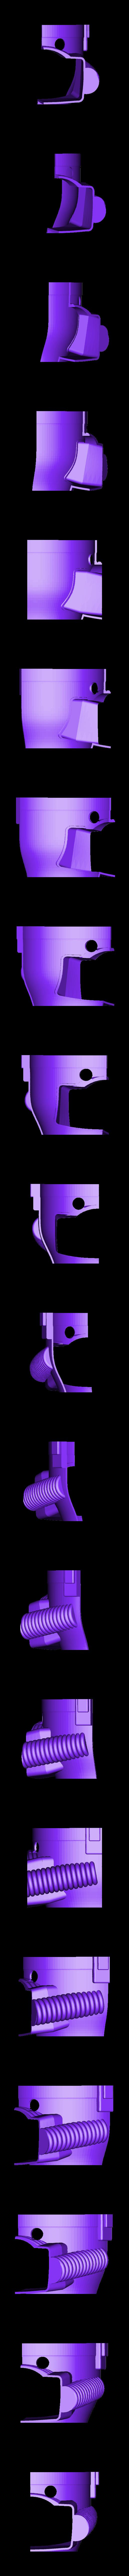 Breen_v3_part_2.stl Download free STL file Breen Helmet • 3D printer template, poblocki1982